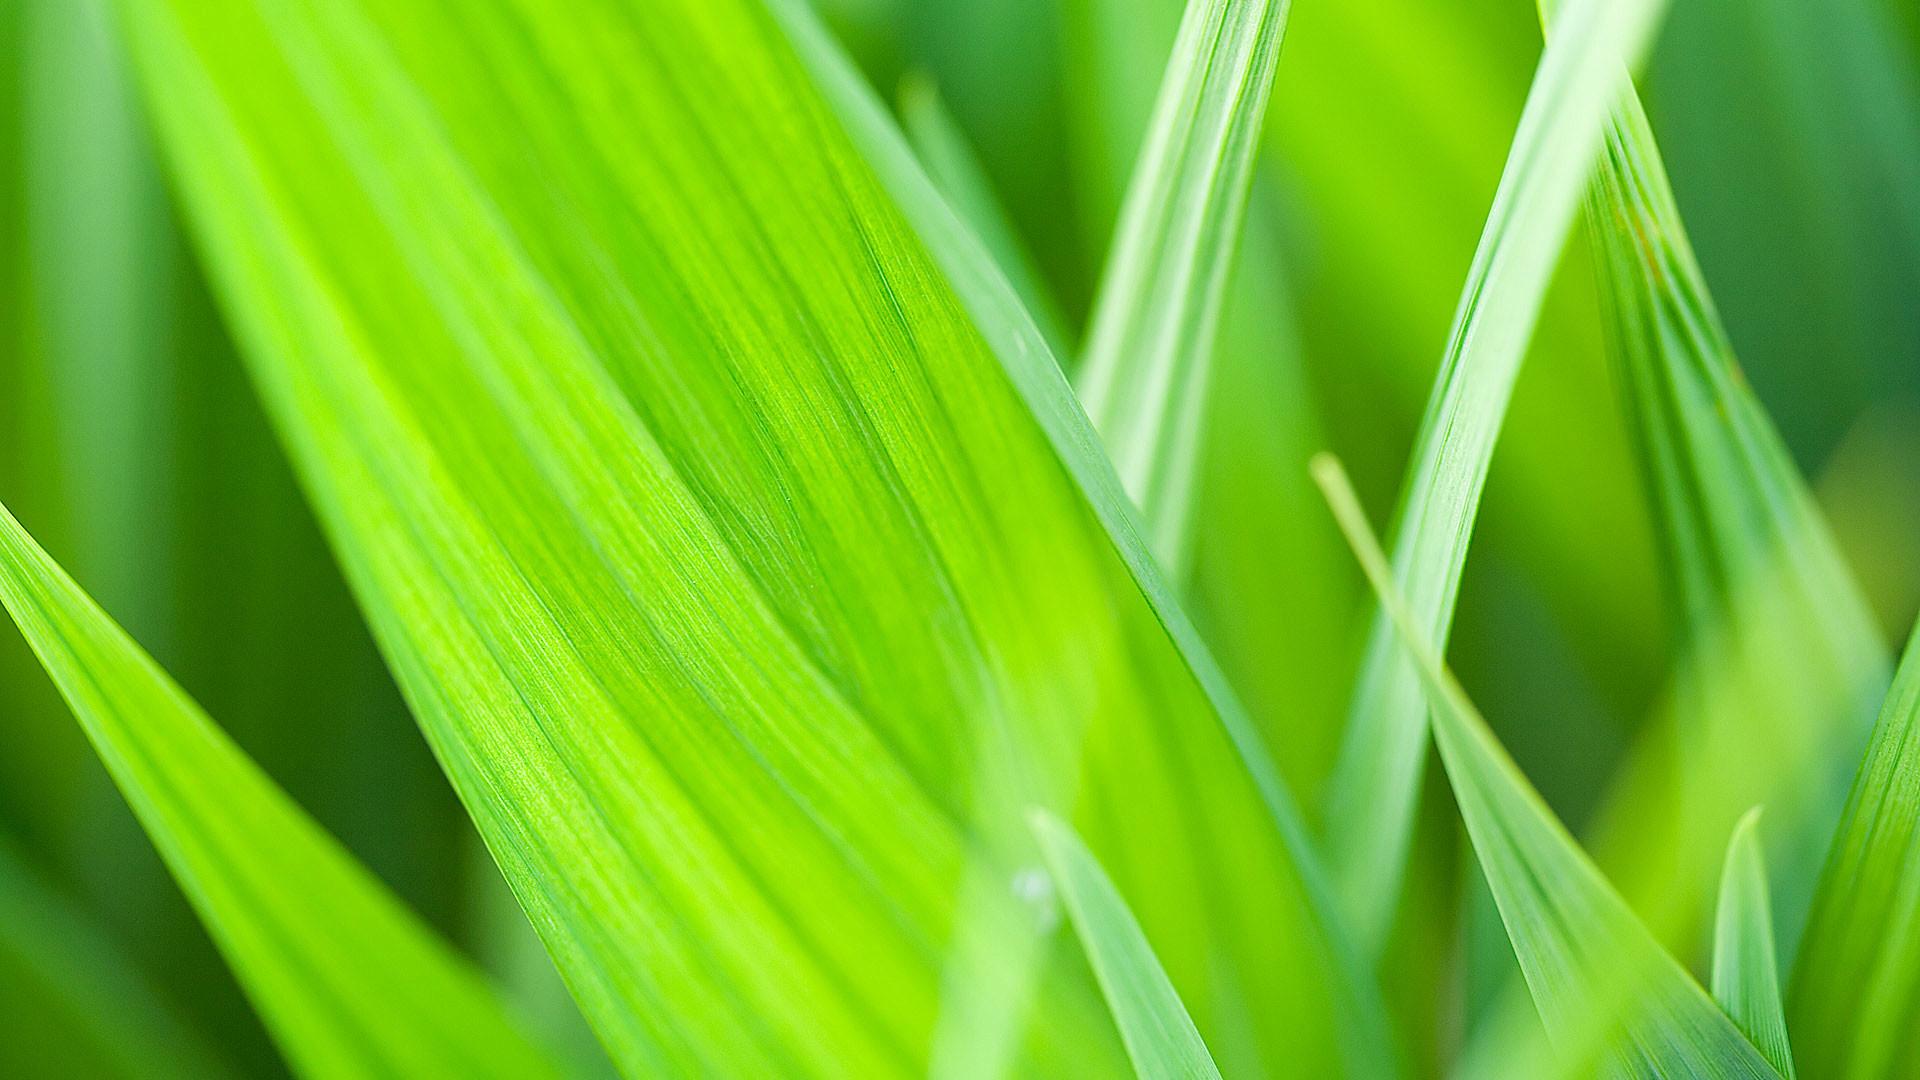 hd pics photos green leaves light green nature desktop background wallpaper